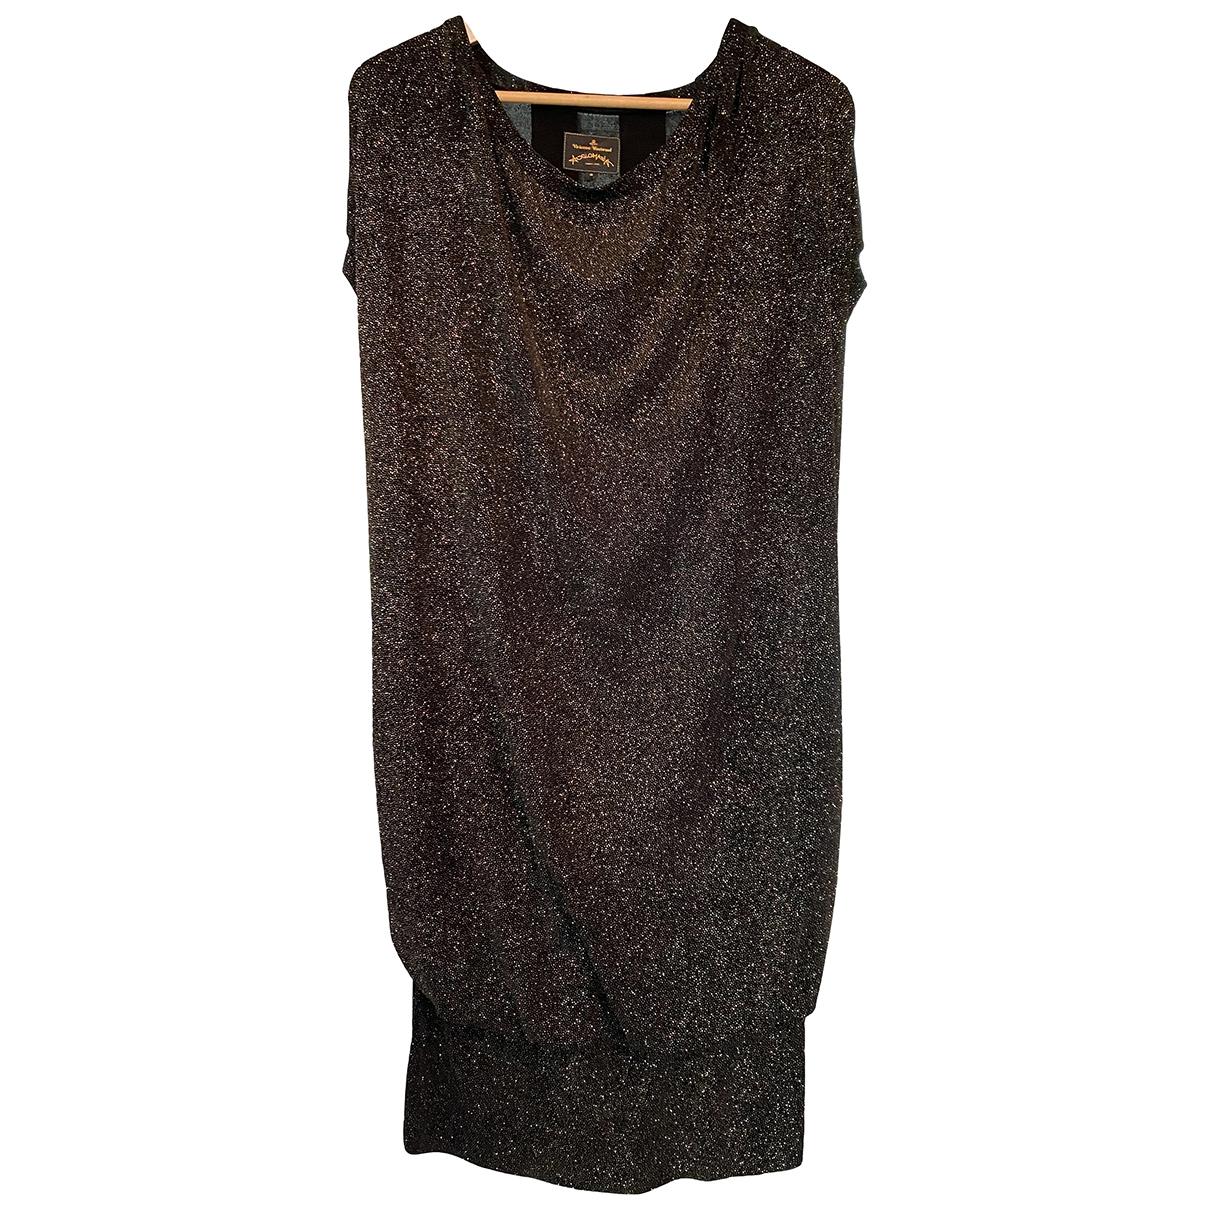 Vivienne Westwood Anglomania \N Black Glitter dress for Women S International